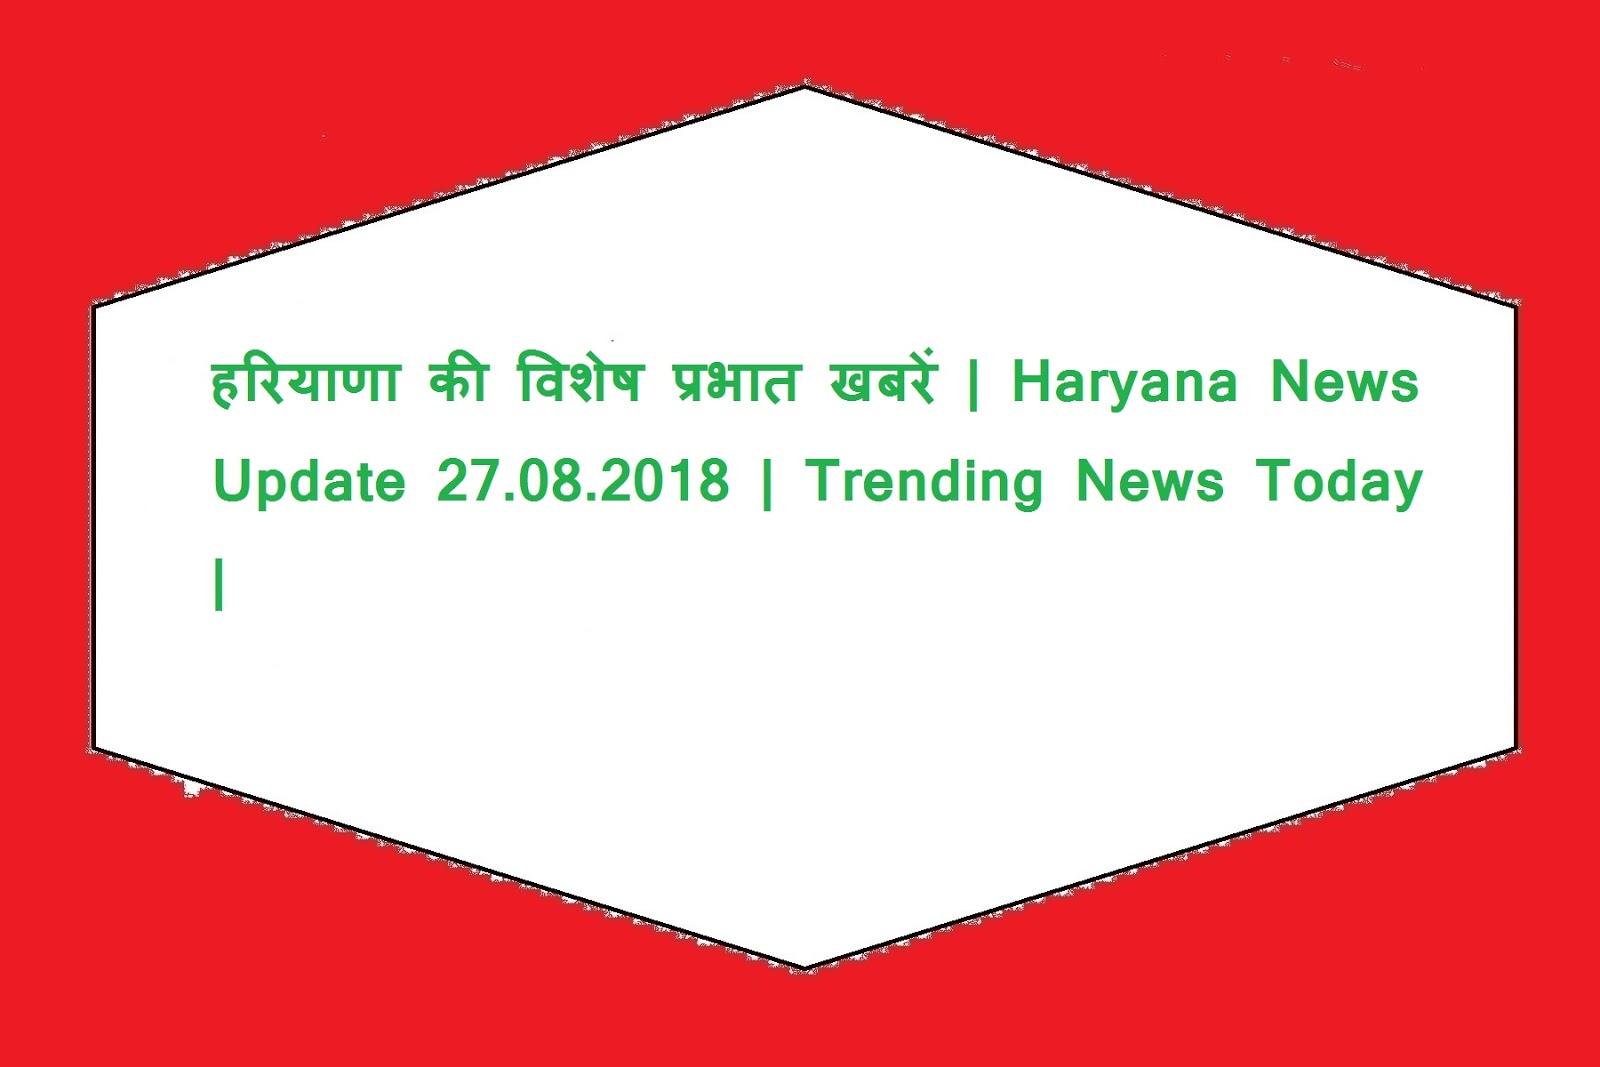 हरियाणा की विशेष प्रभात खबरें | Haryana News Update 27.08.2018 | Trending News Today